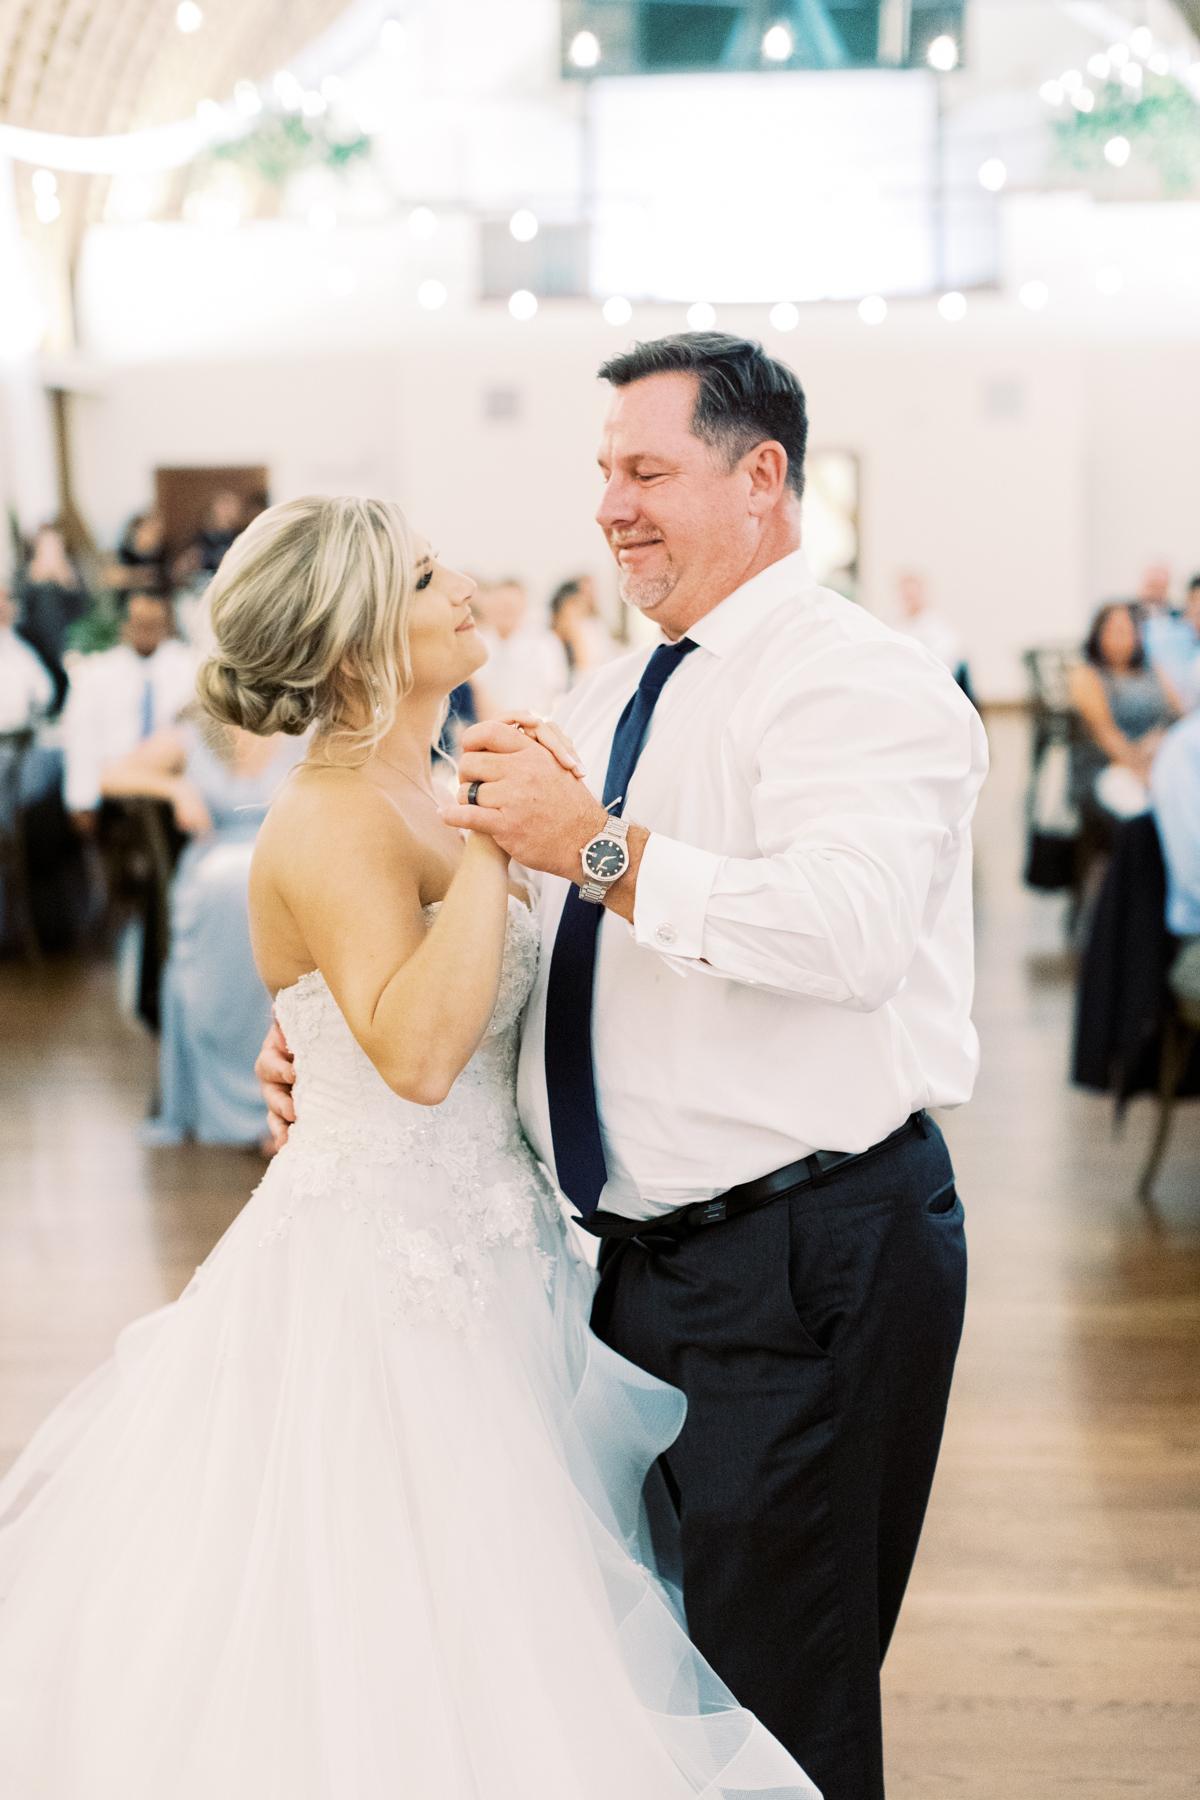 winmock-kinderton-wedding-079.jpg